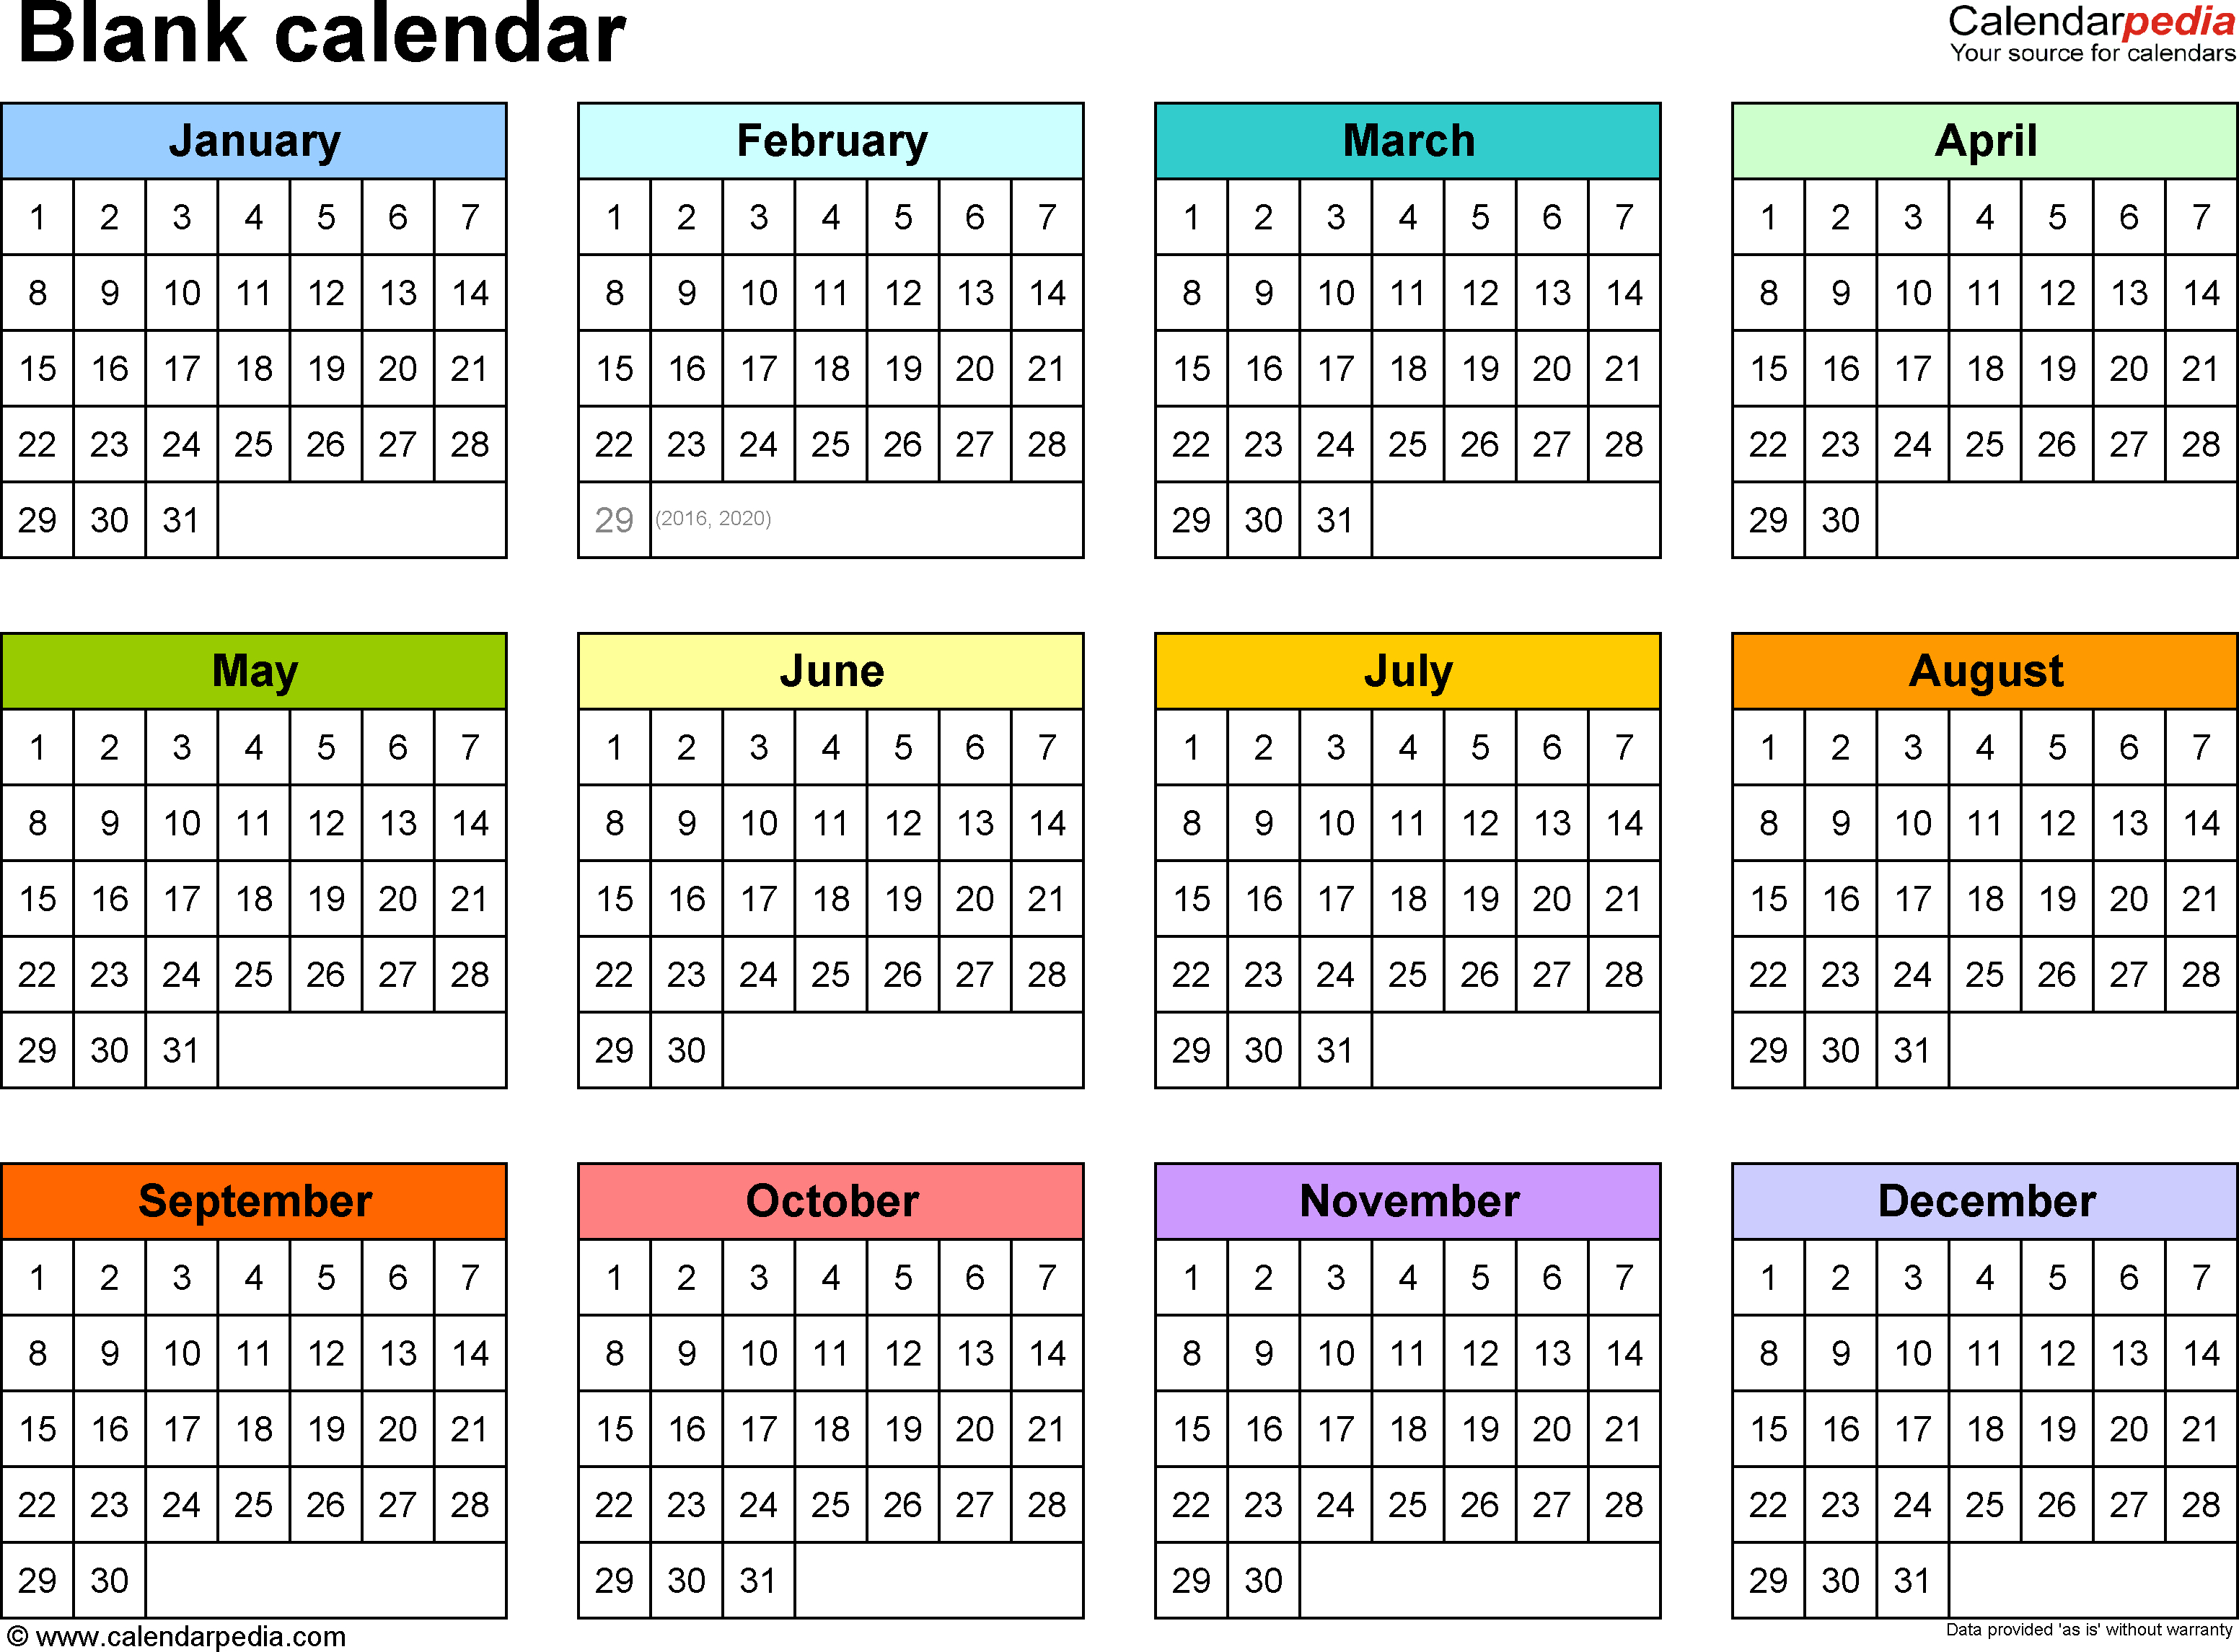 Blank Calendar - 9 Free Printable Microsoft Word Templates for 1 Month Calendar Printable Blank